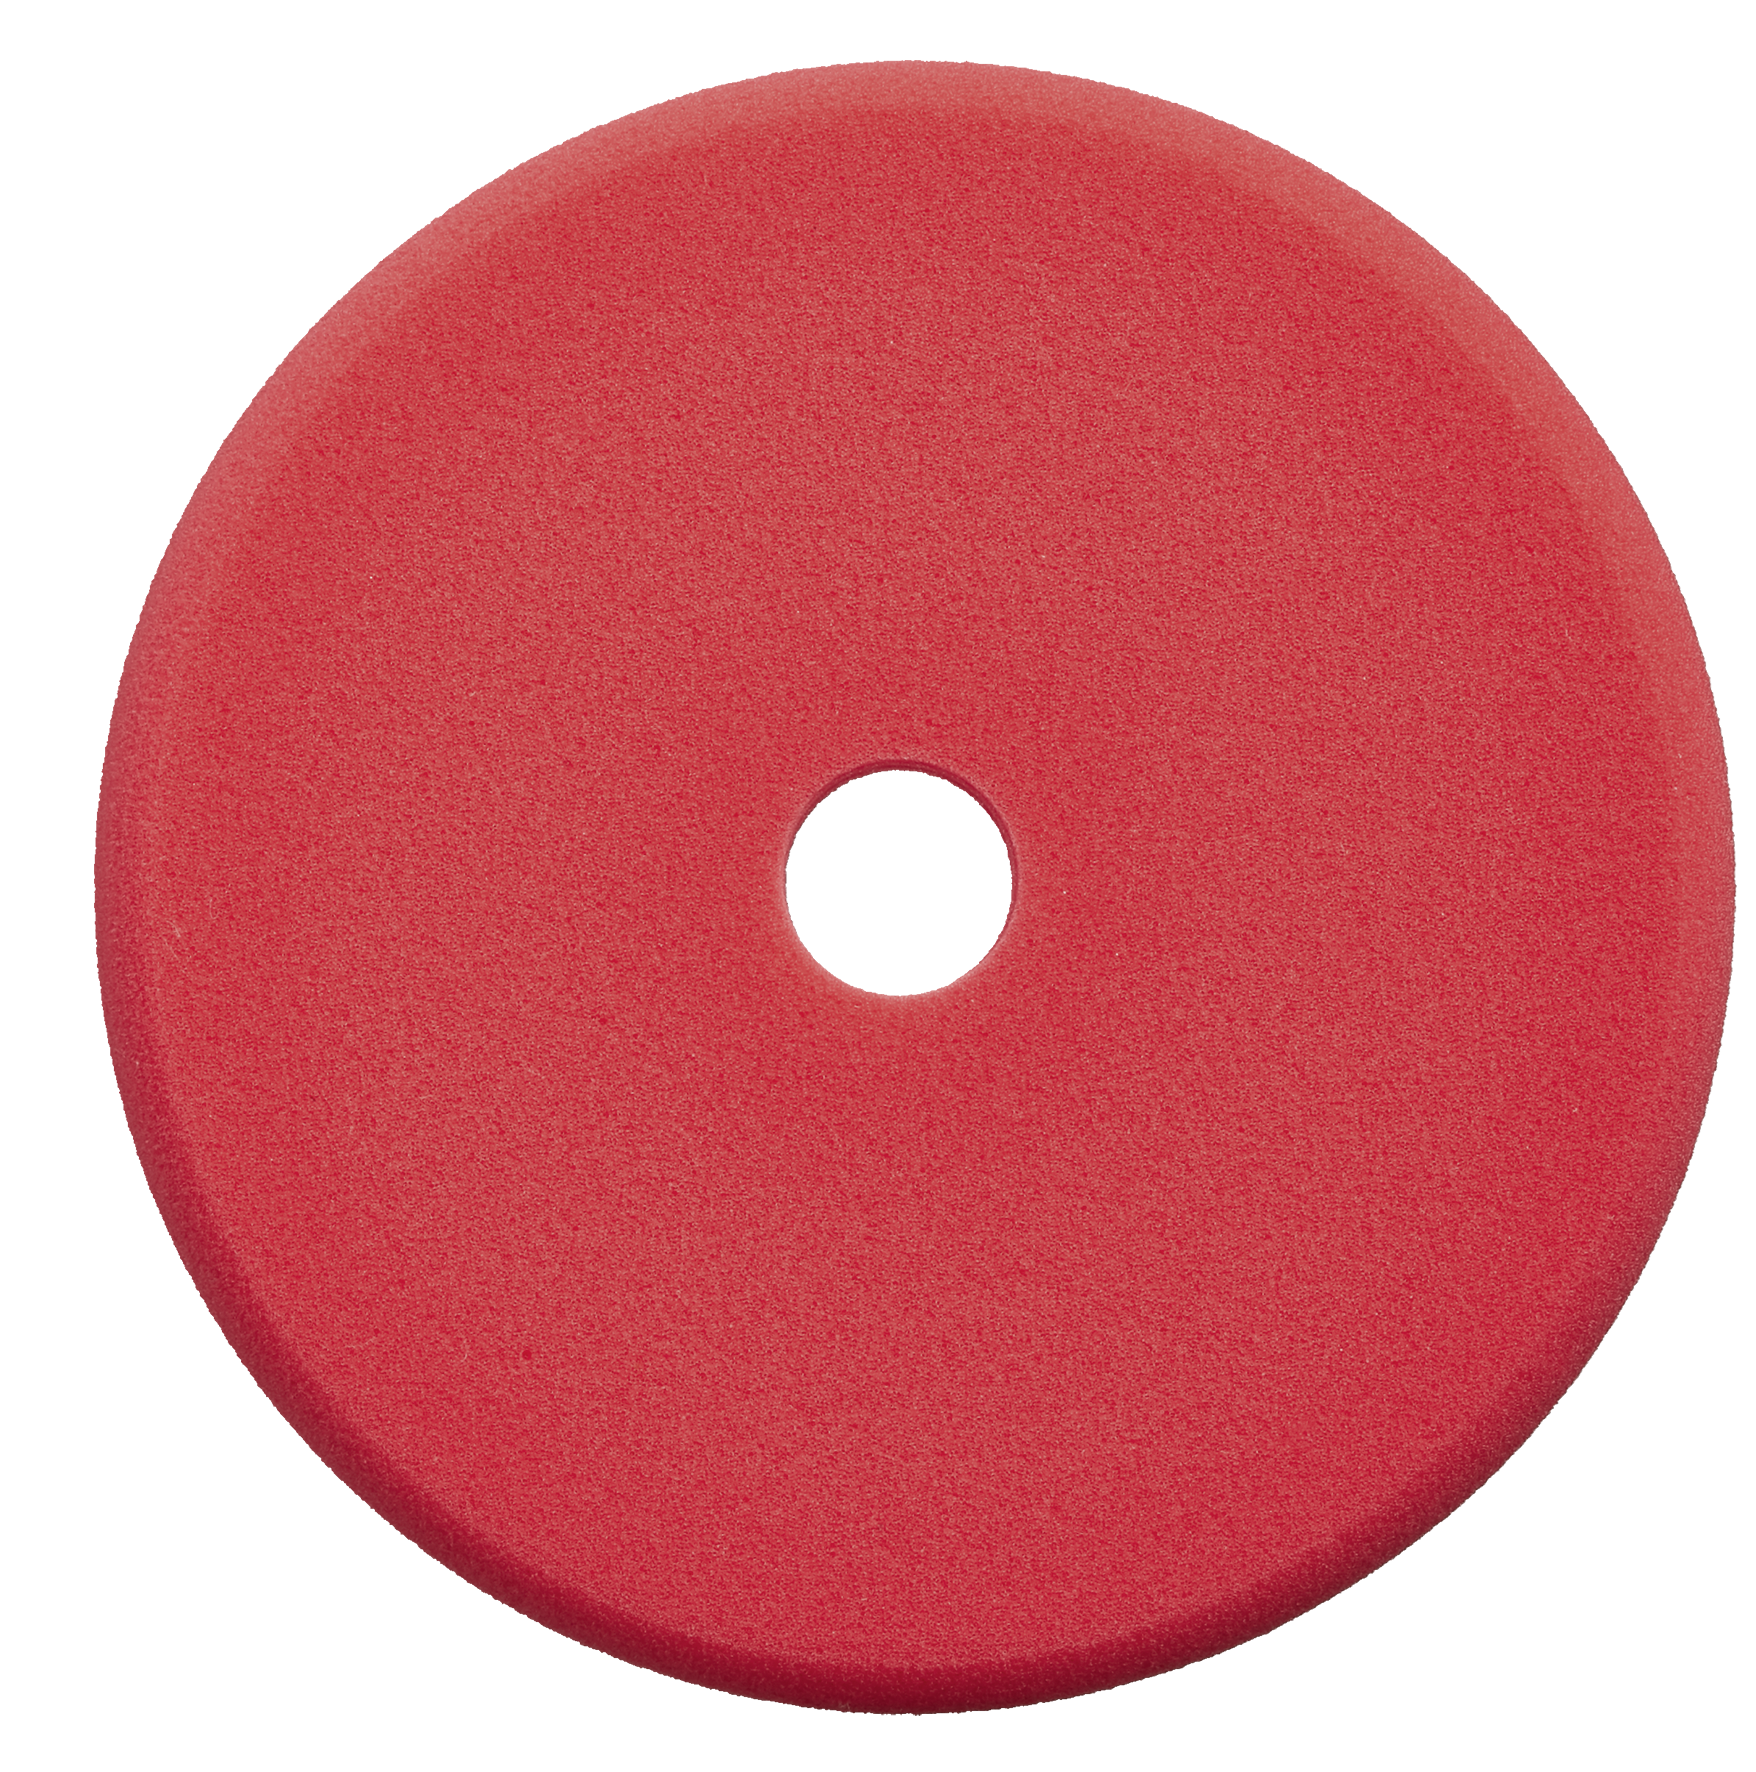 SONAX Polishing Sponge red 143 DA CutPad